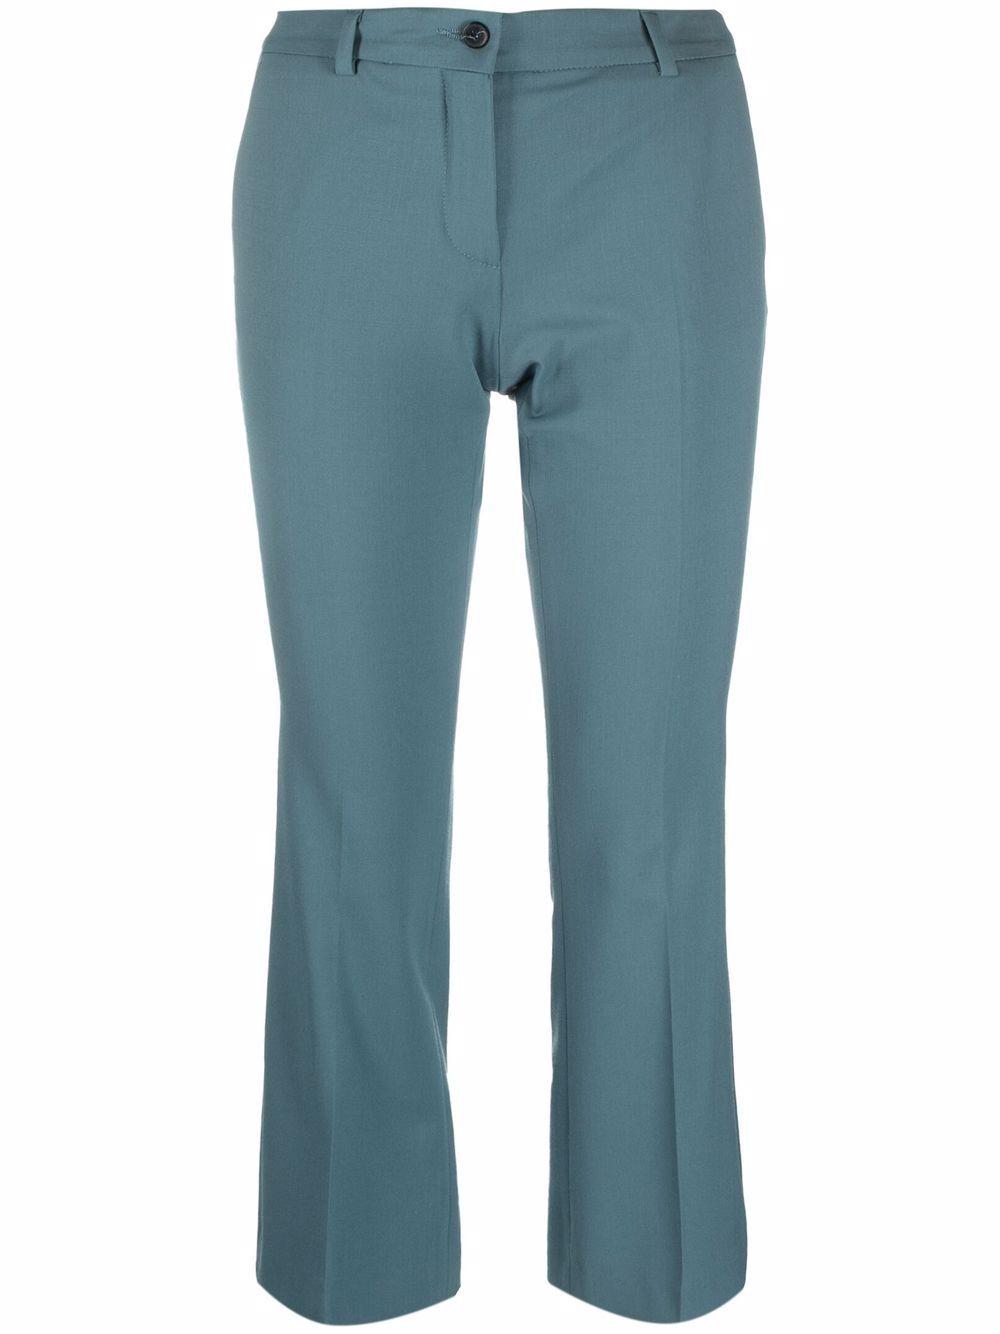 Teal-blue wool cropped tailored trousers ALBERTO BIANI      CC815-WO024182